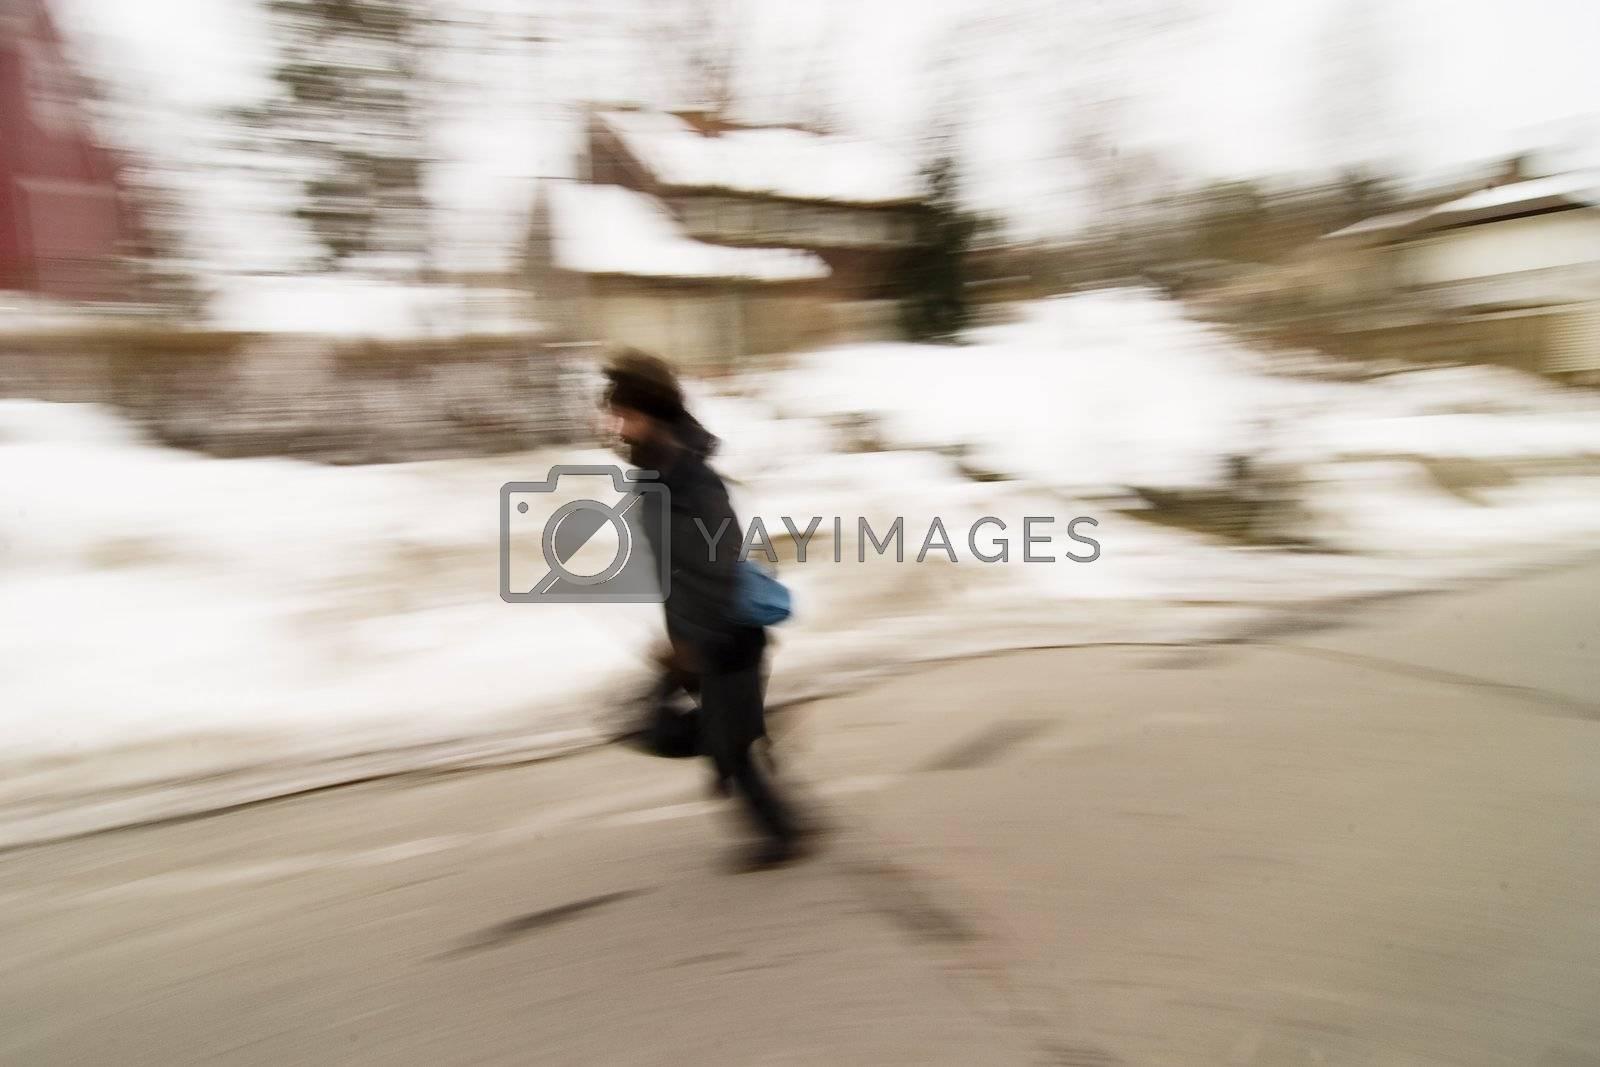 A motion blur image of a man running.